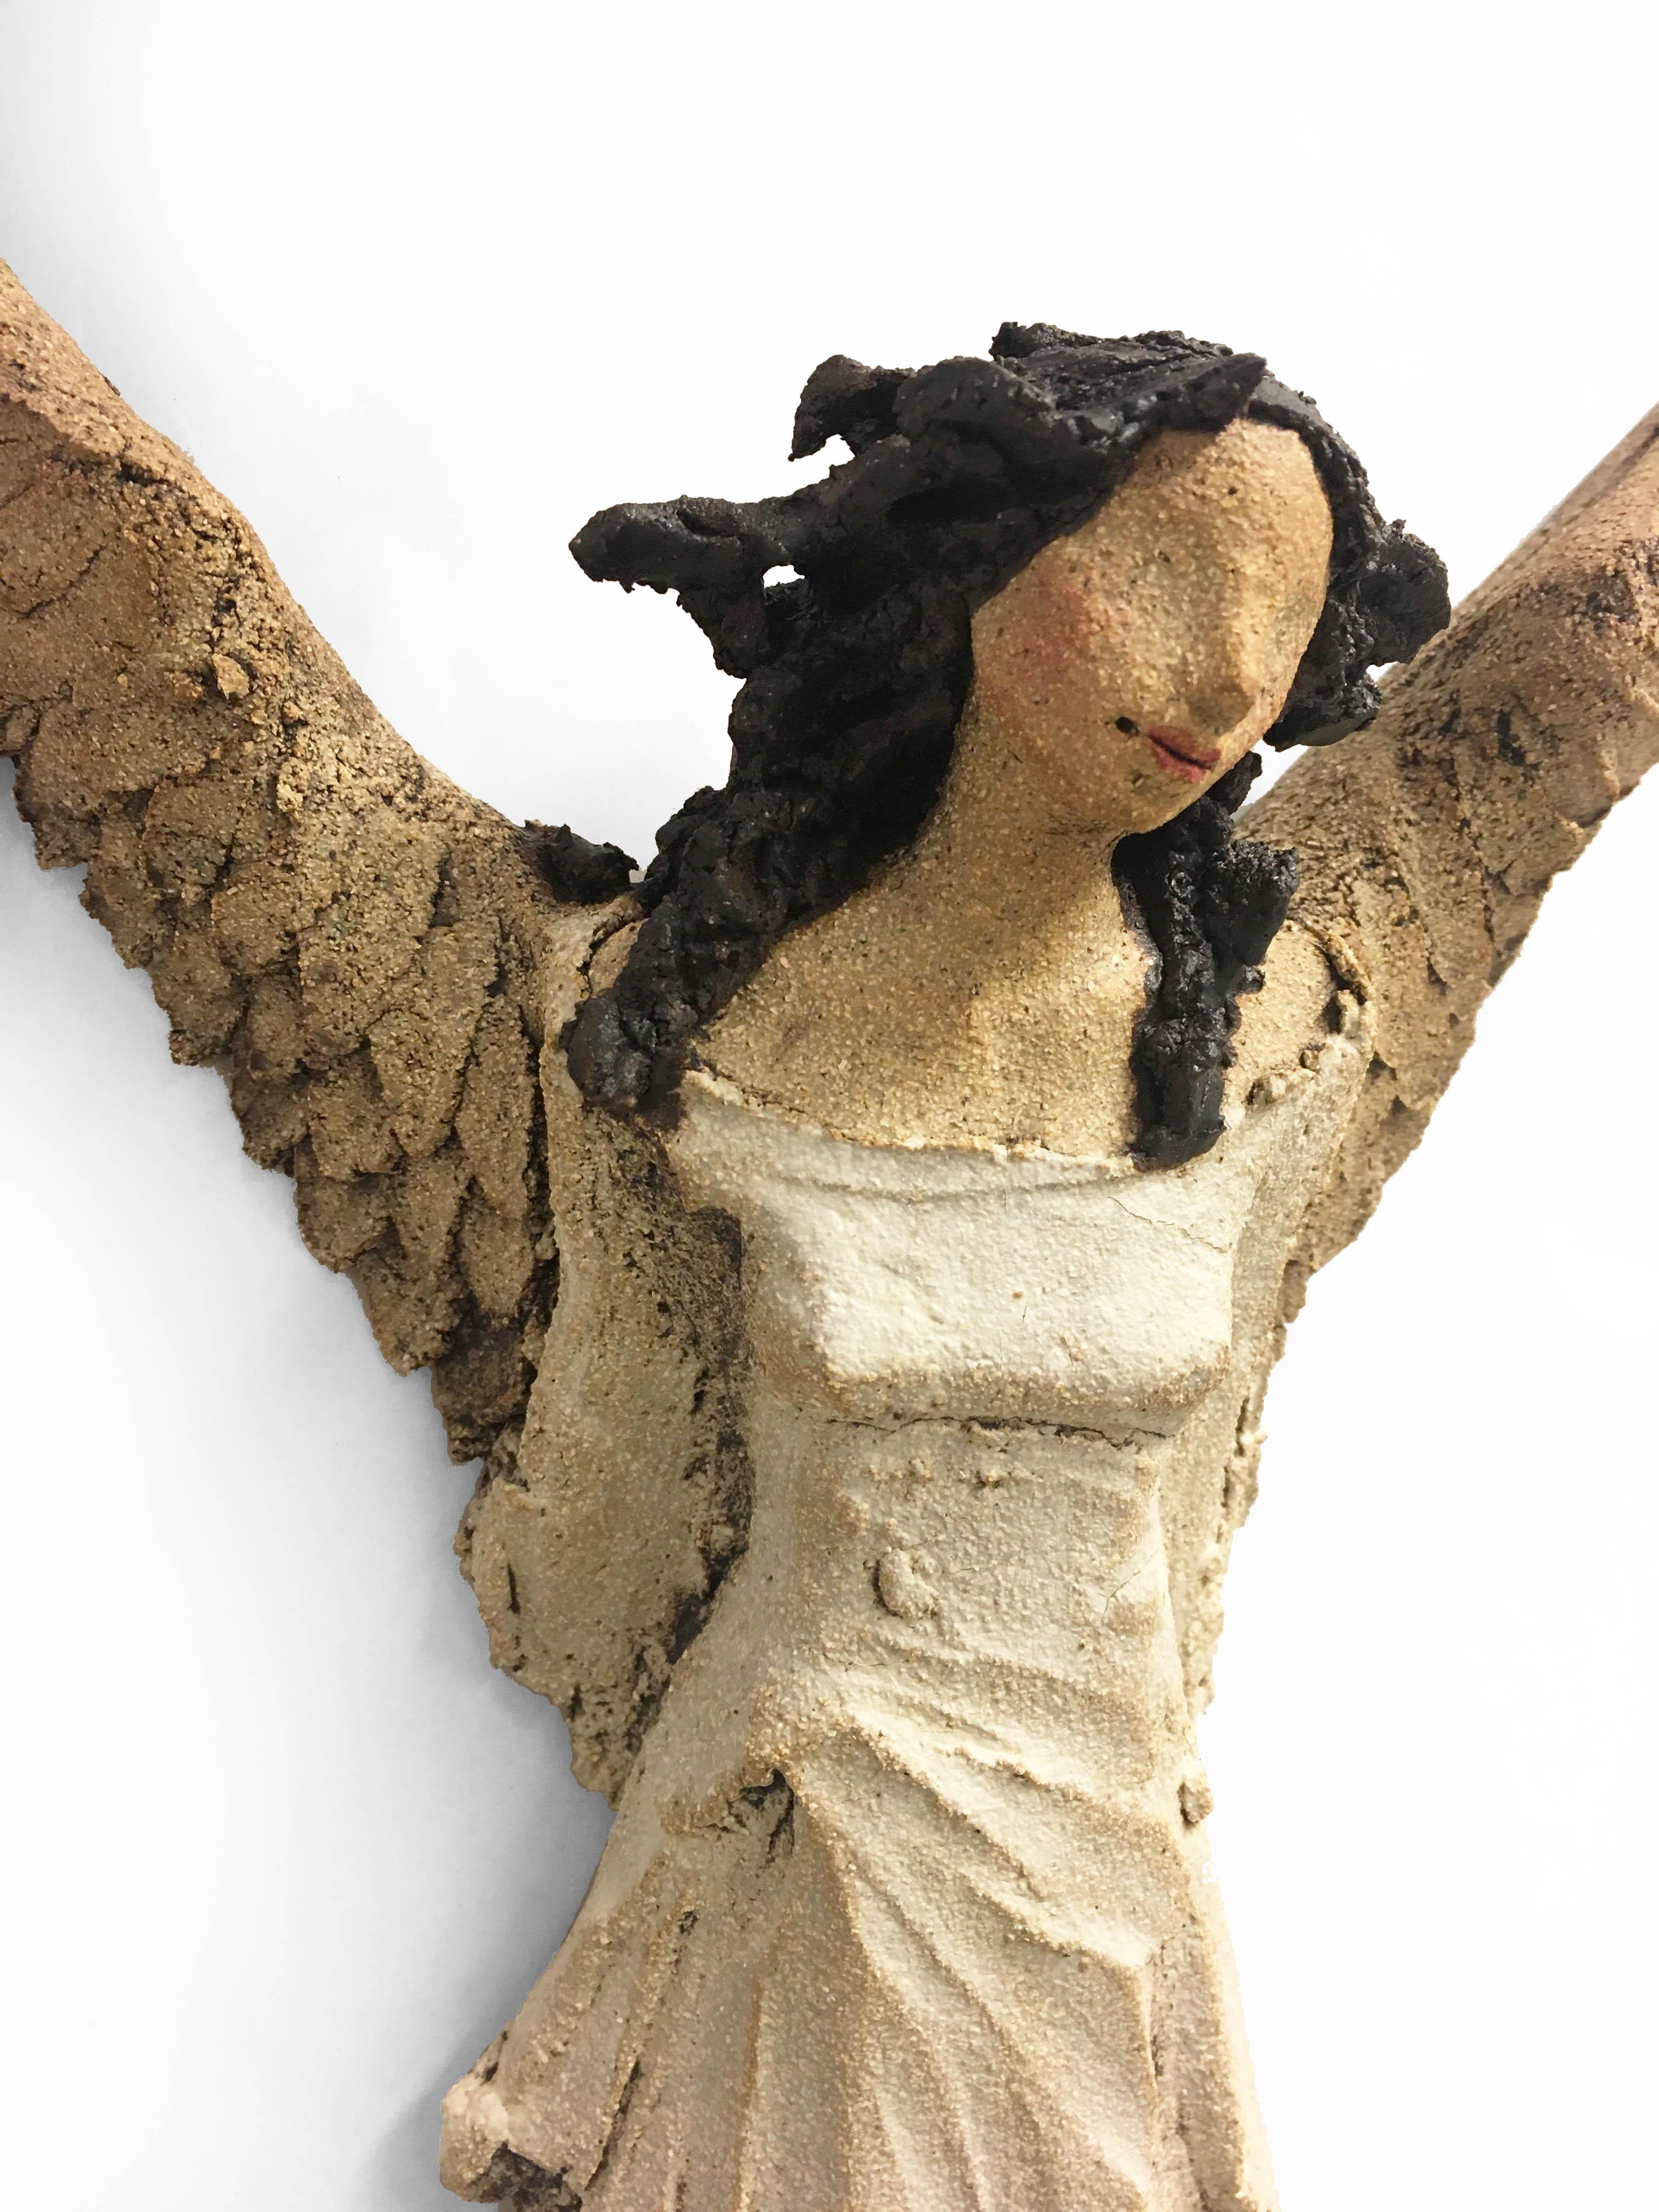 hvit engel Ingun Dahlin skulptur keramikk